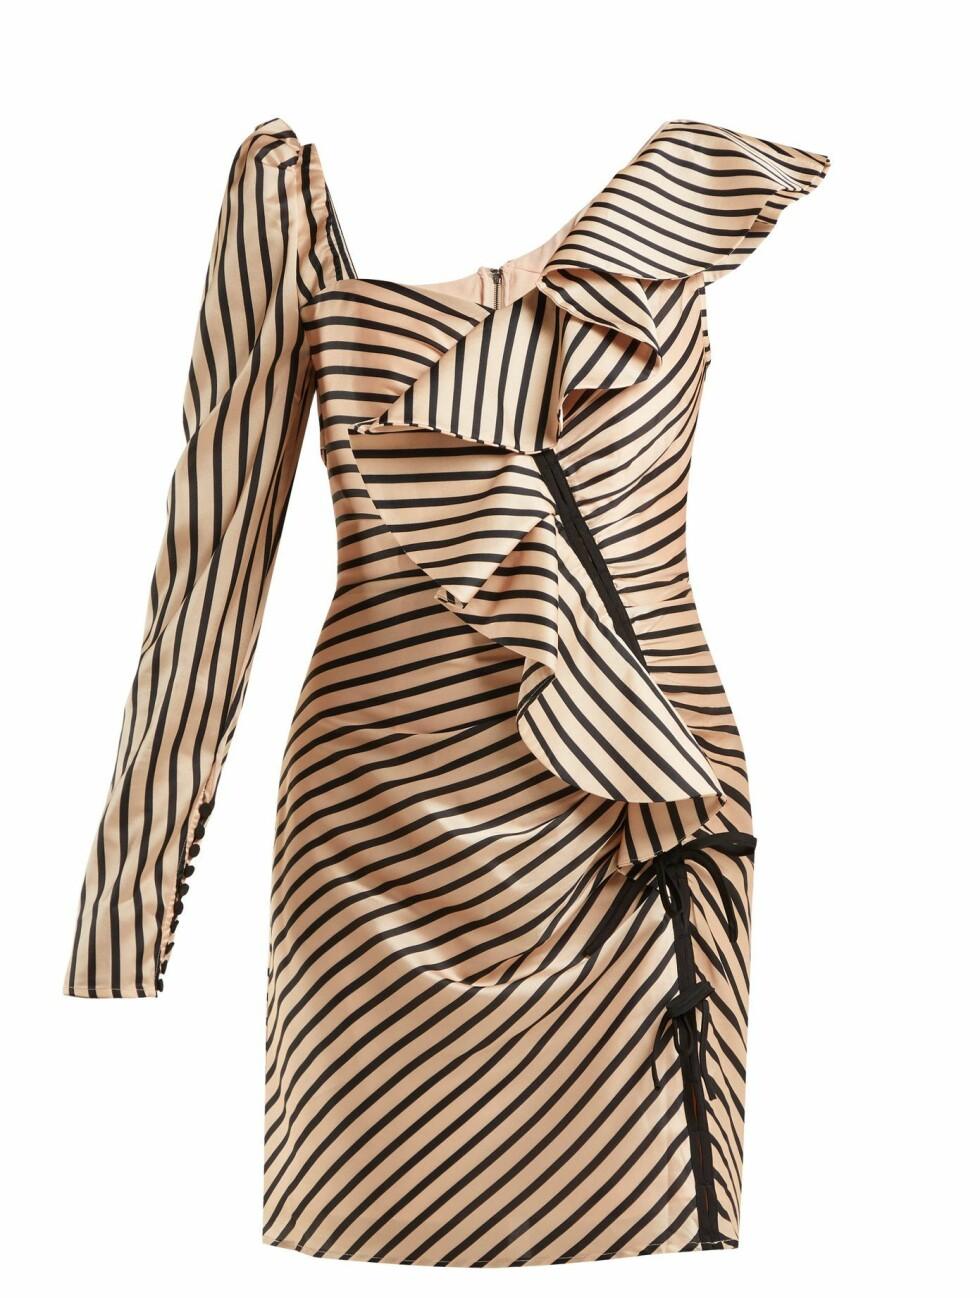 Kjole fra Self-Portrait |1600,-| https://www.matchesfashion.com/intl/products/Self-portrait-Asymmetric-striped-satin-mini-dress-1211478